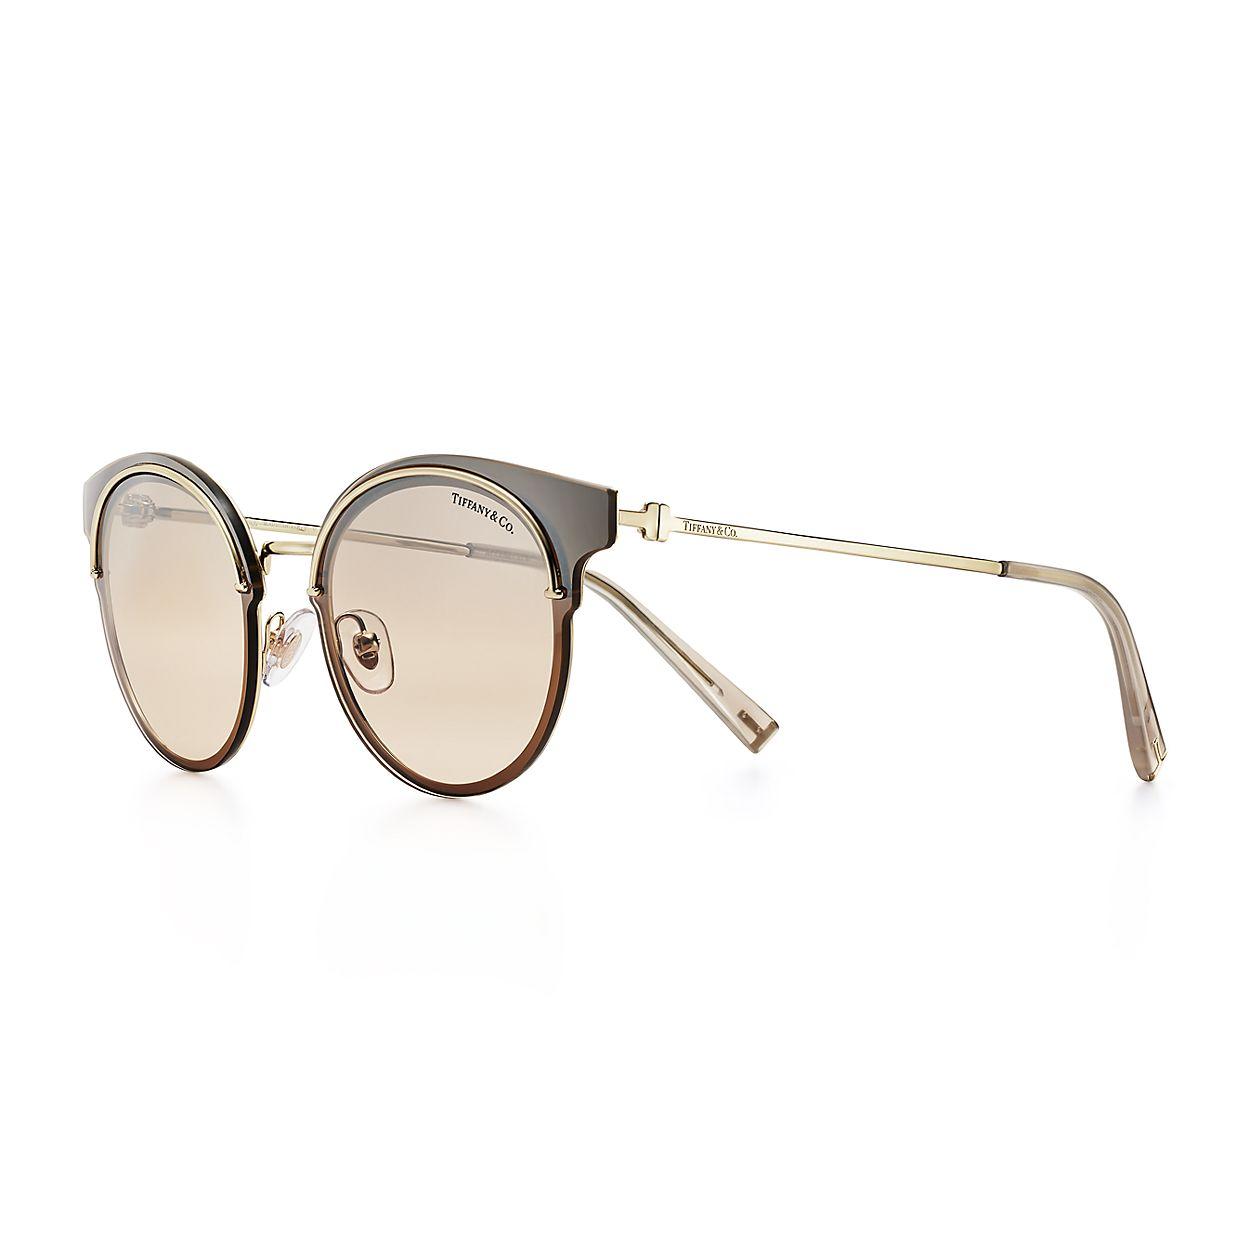 6dfb8ed663 Tiffany T round sunglasses in silver-colored metal.   Tiffany & Co.